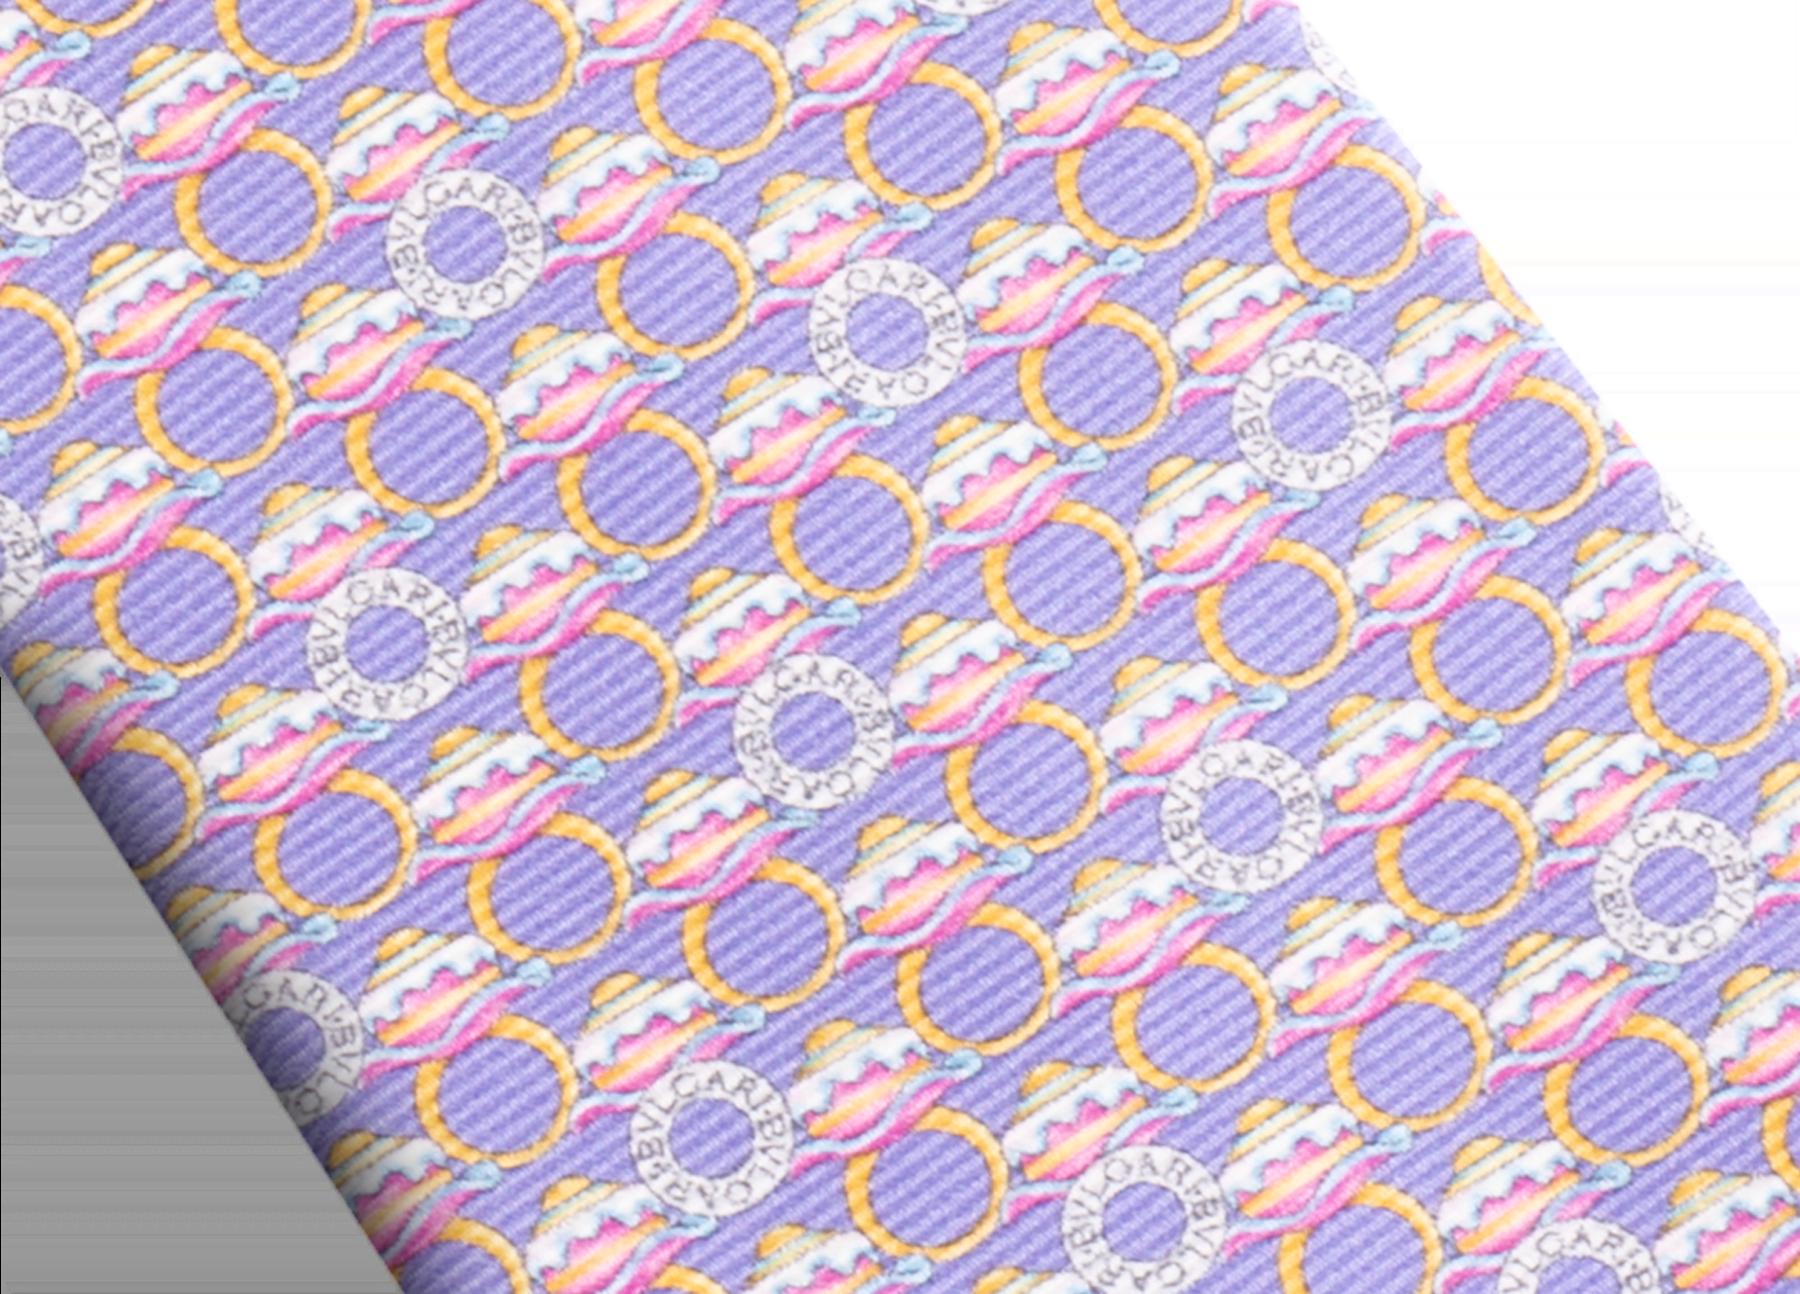 Lilac Ring Cake Logo pattern seven-fold tie in fine saglione printed silk. 244194 image 2